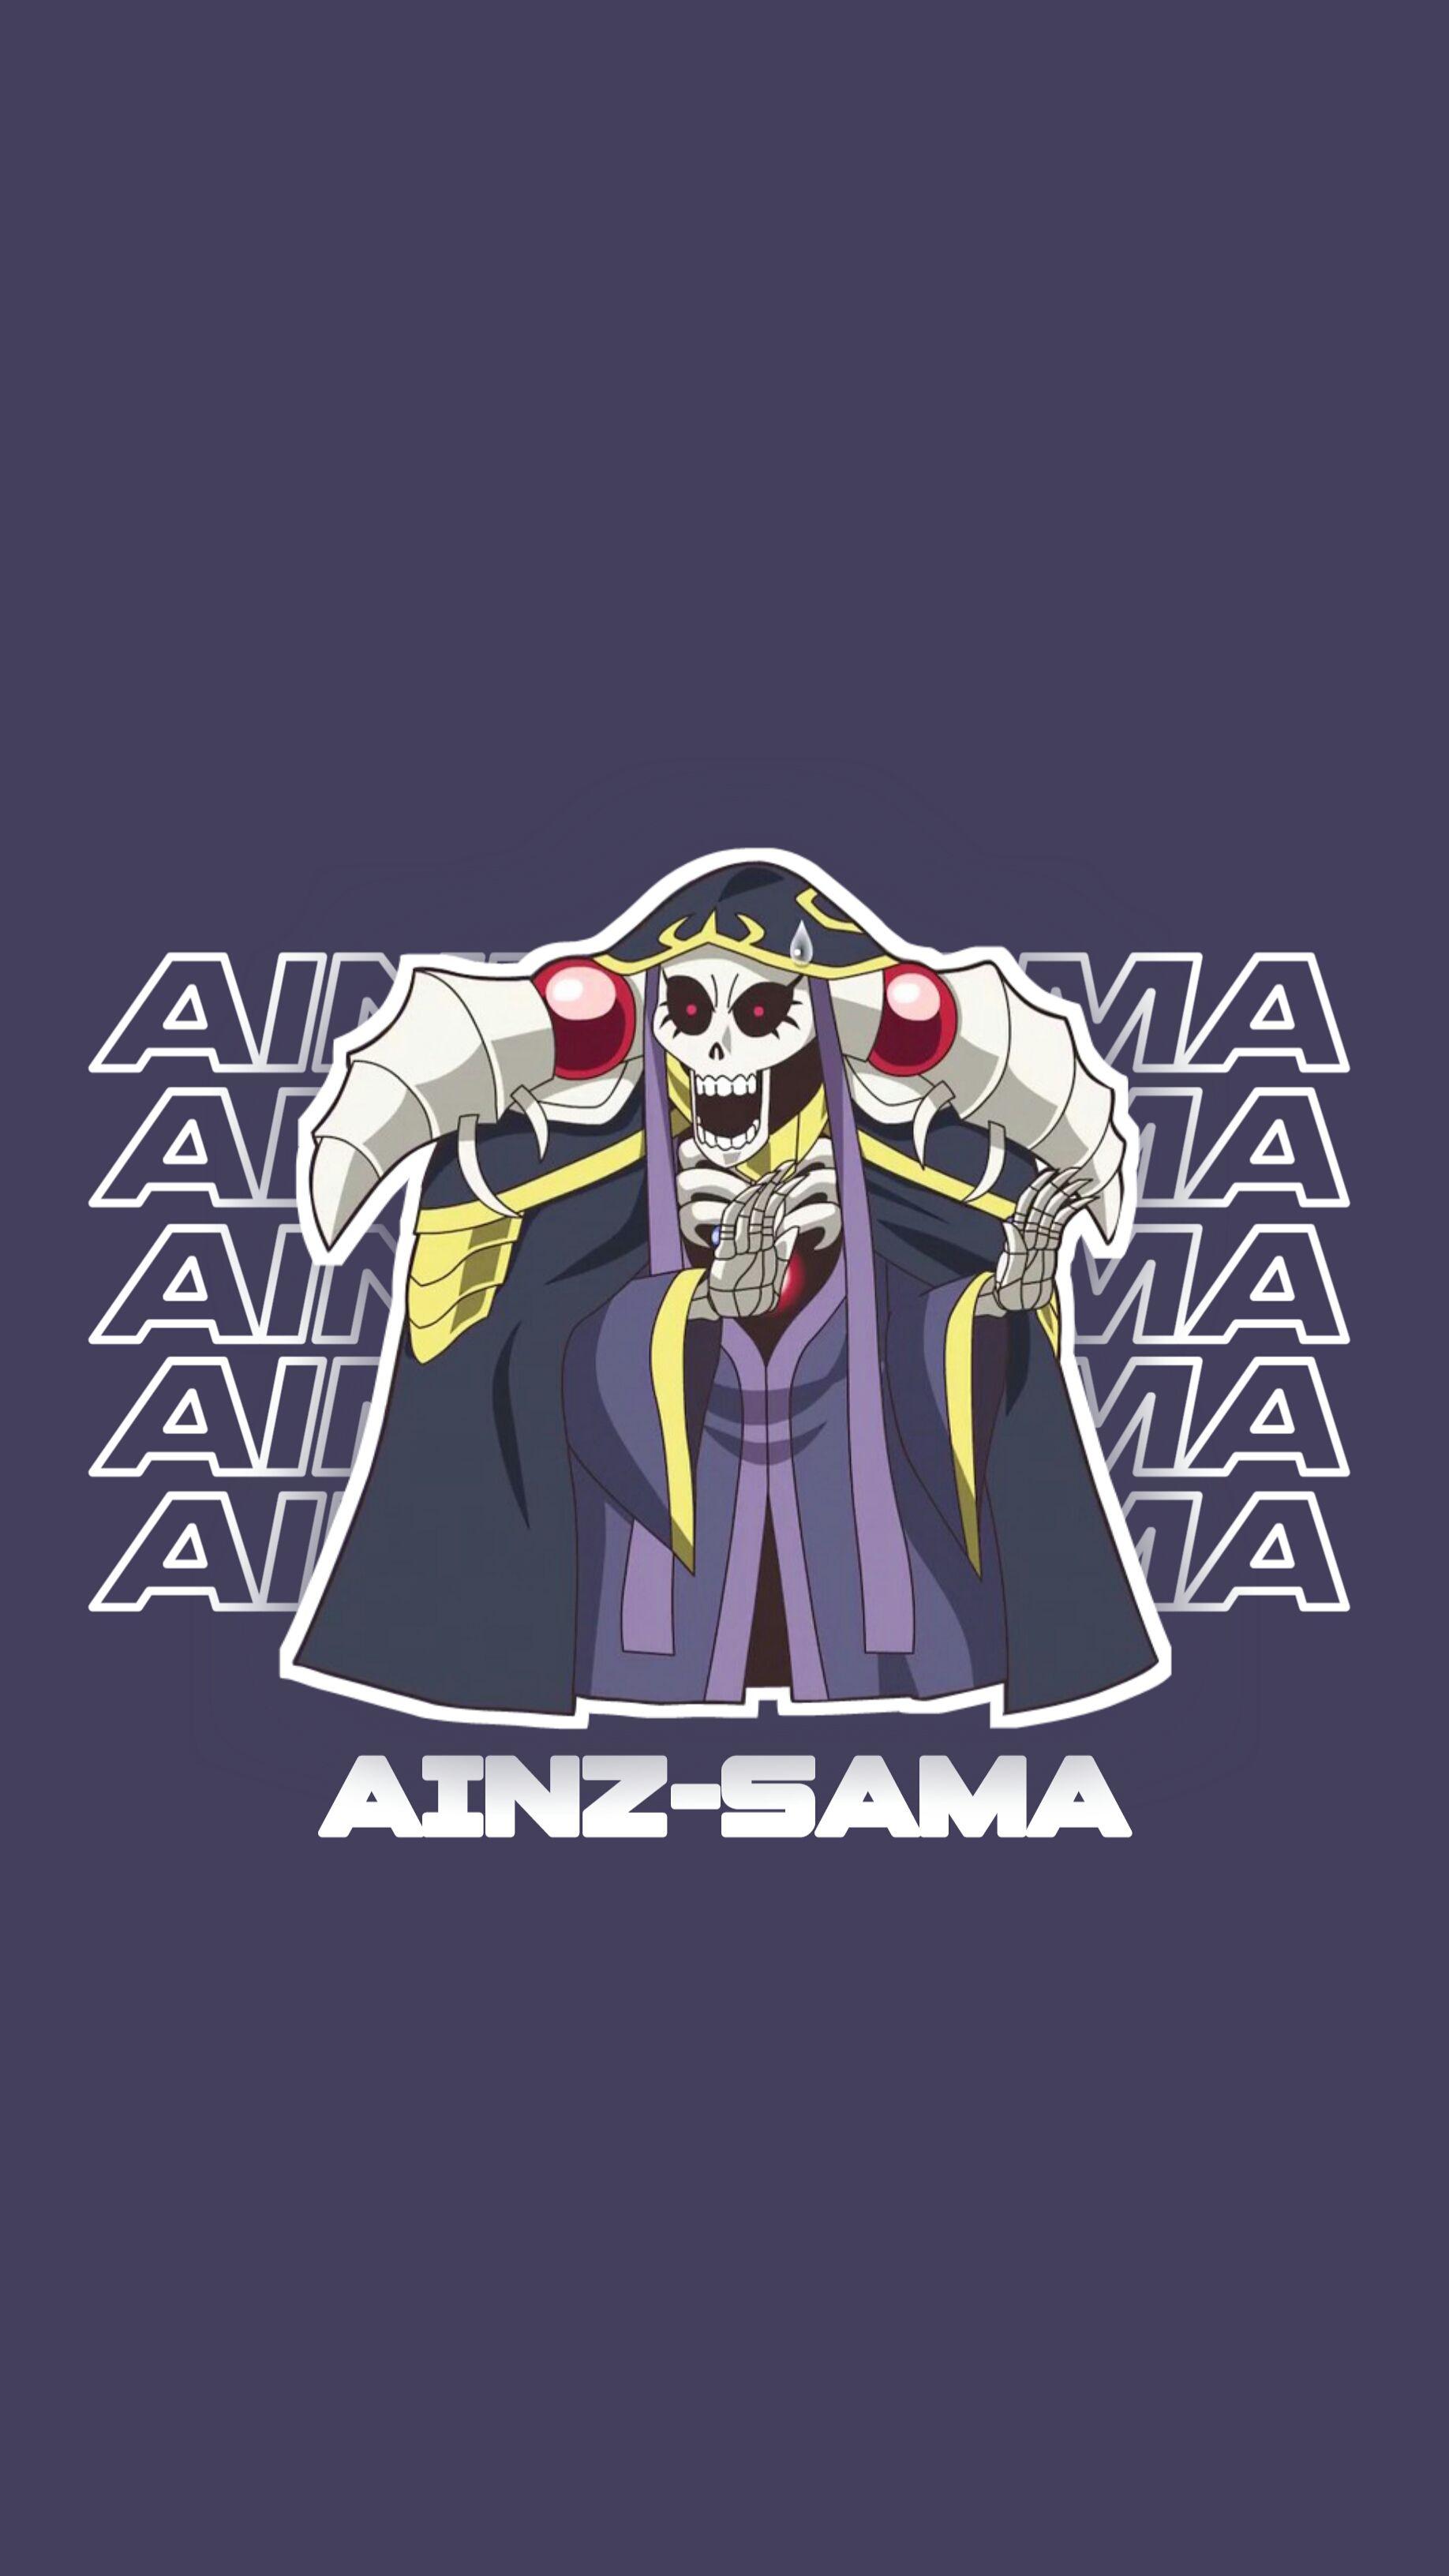 Ainzsama overlord wallpaper in 2020 Wallpaper, Anime, Art